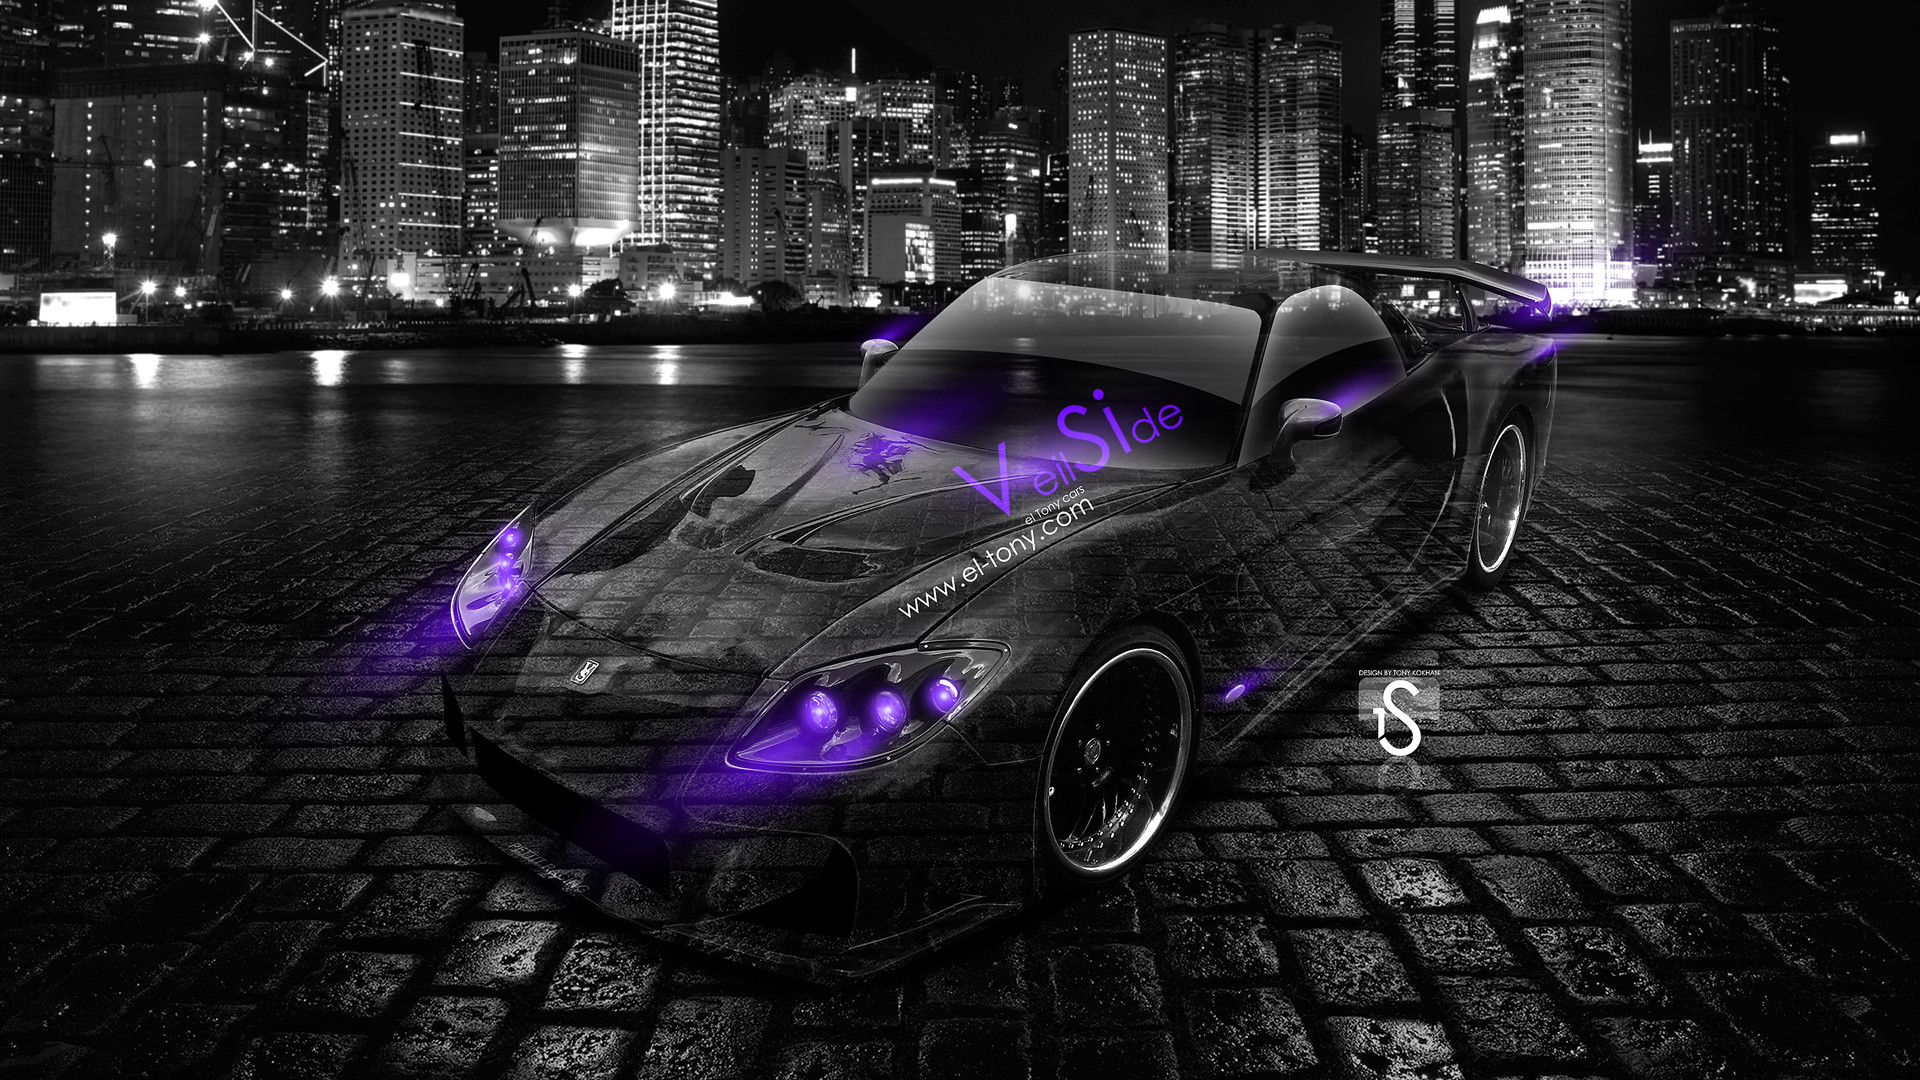 Delicieux 1920x1080 Mazda RX7 Veilside Bodykit JDM Violet Neon Crystal